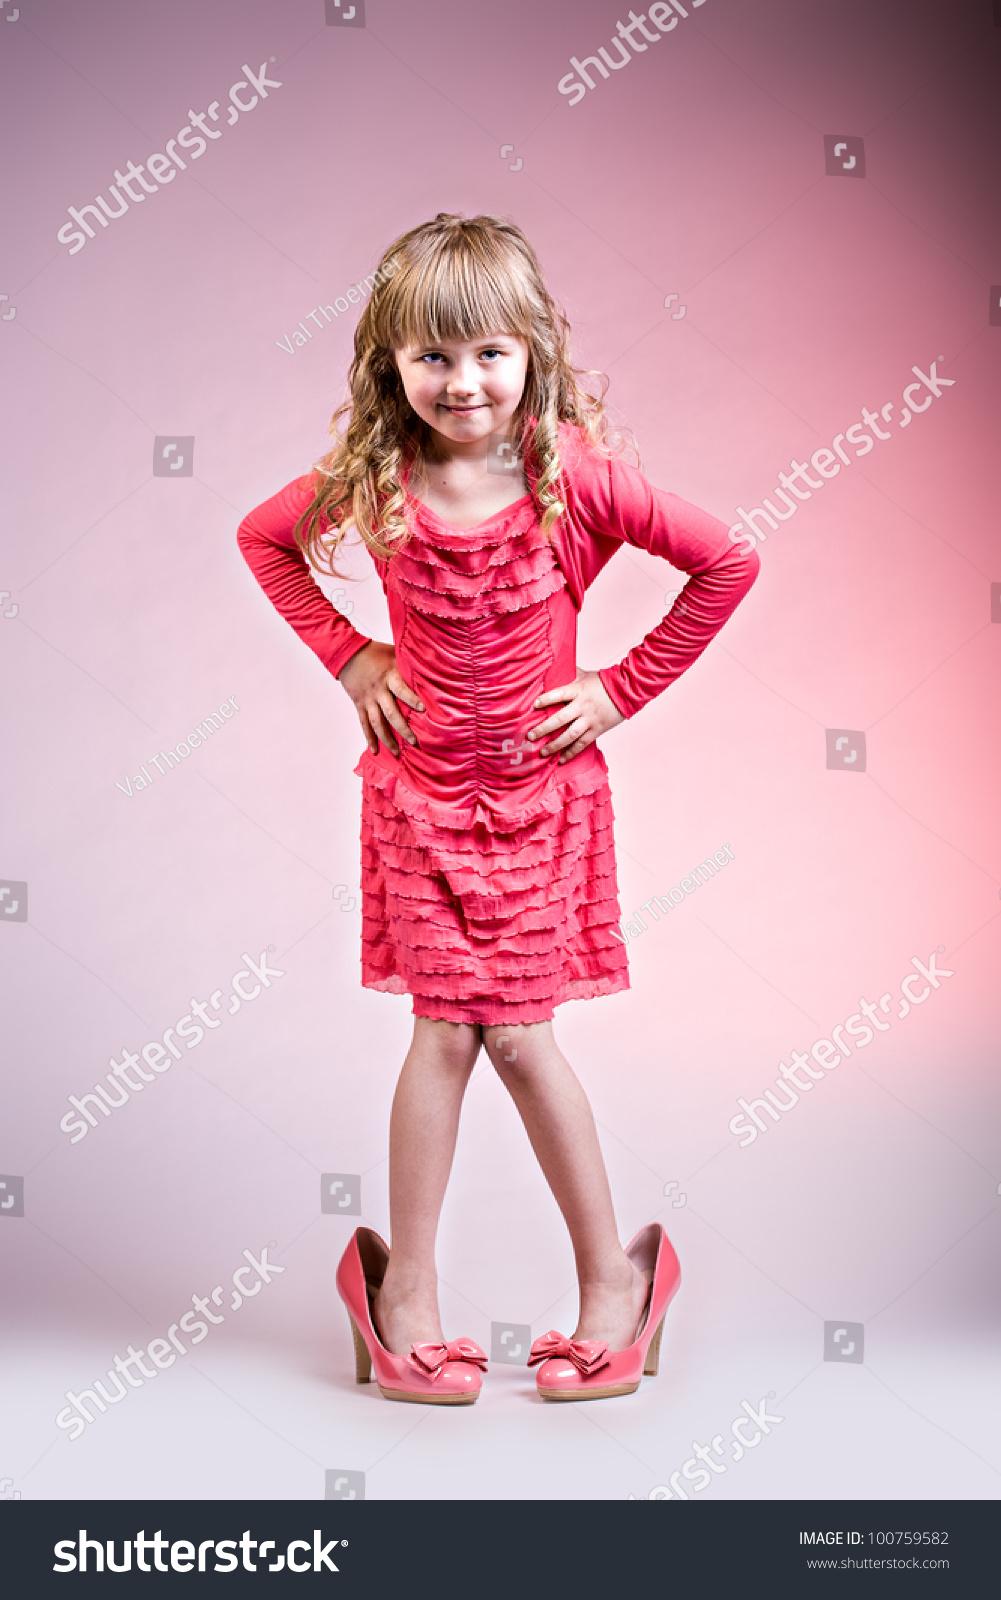 young girl model images usseekcom